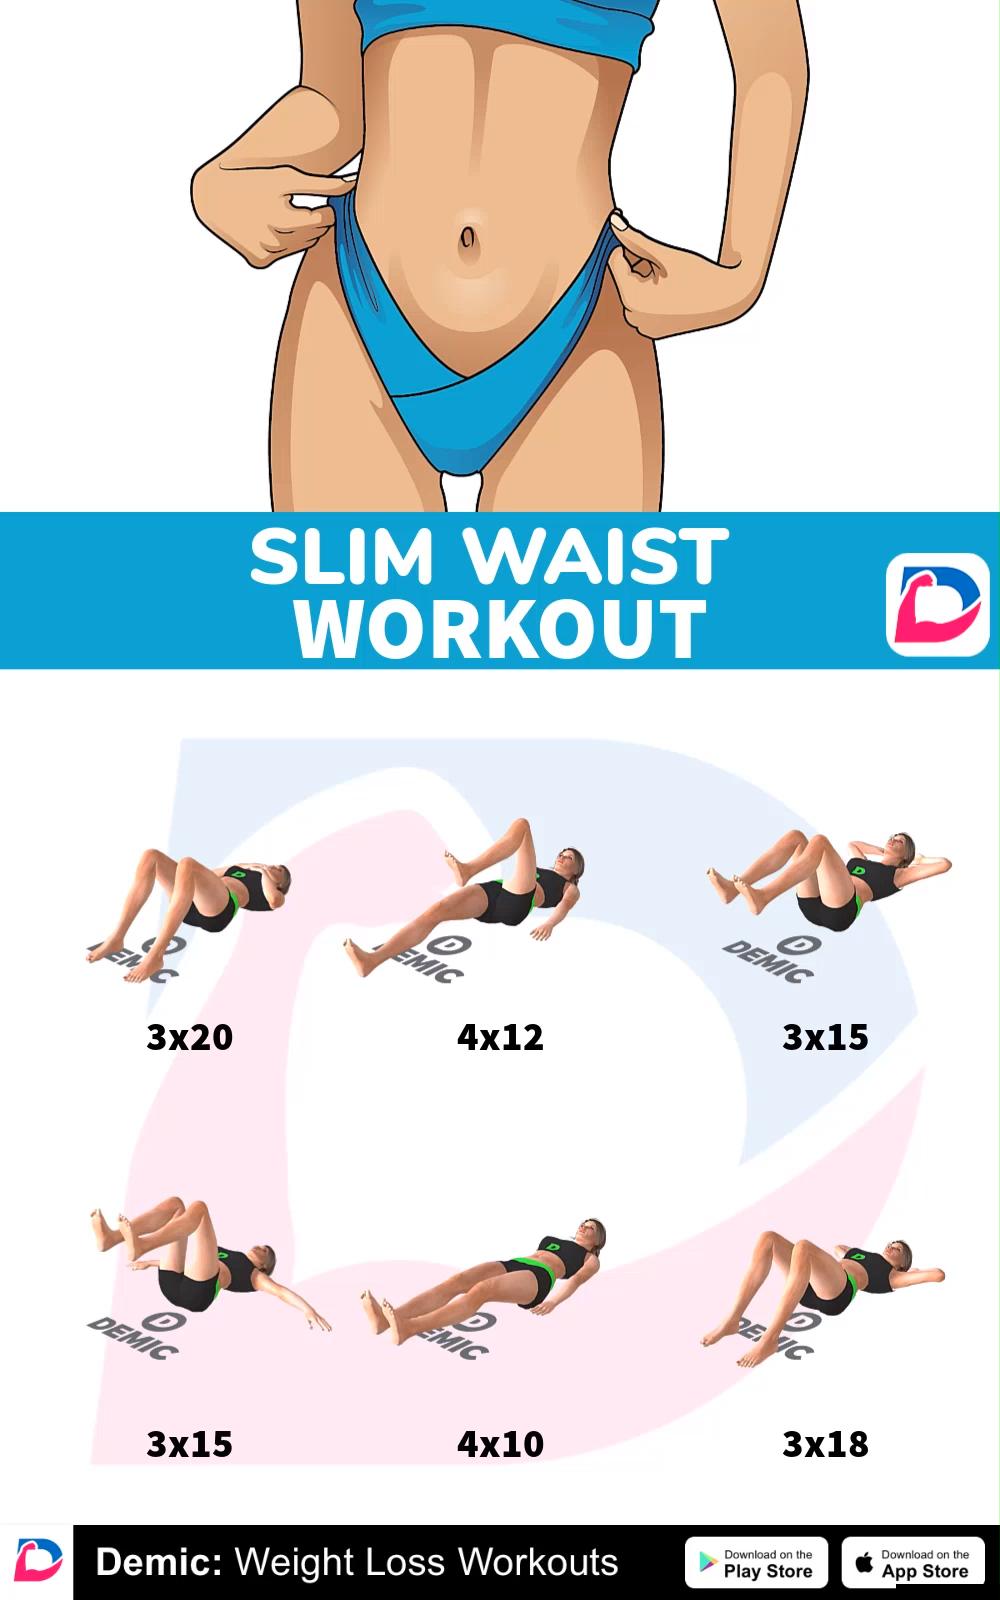 Slim Waist Workout  #fitnessexercises #bellyfat #fatburn #burnfat #weightlose #fitness #workout #dem...